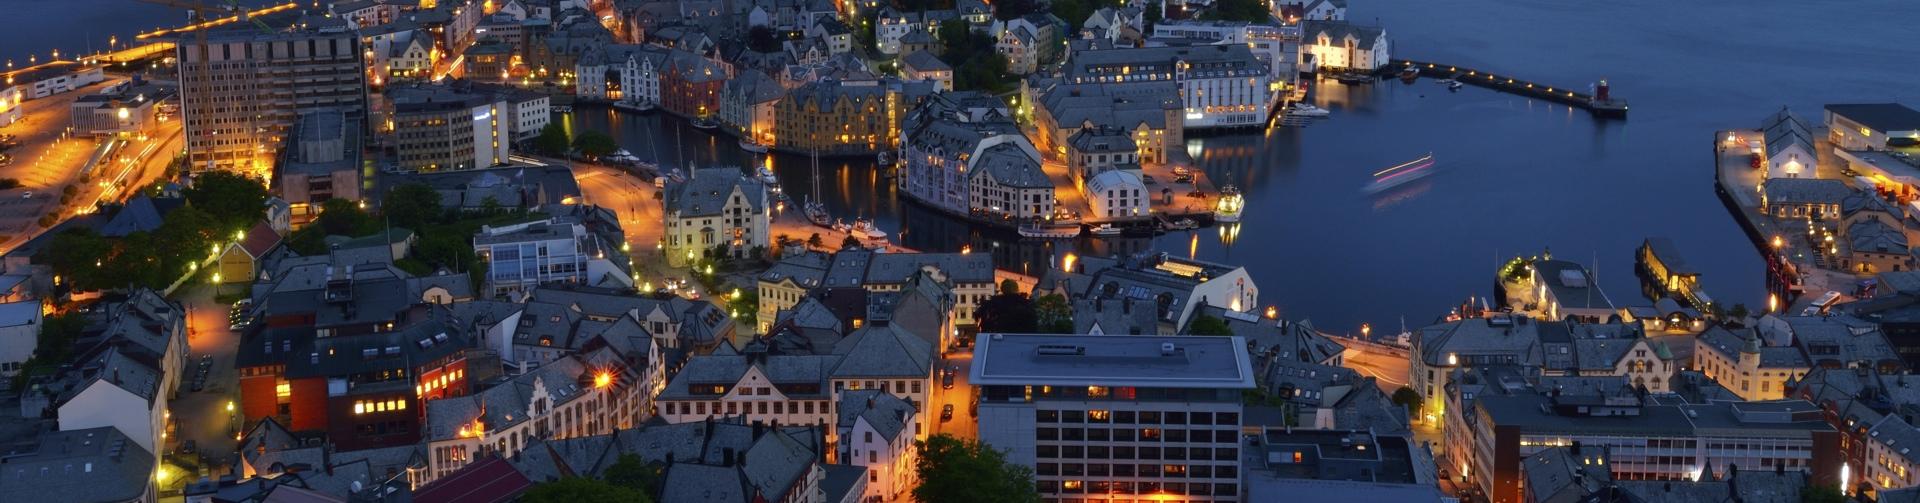 norsk dating eskorte kristiansand